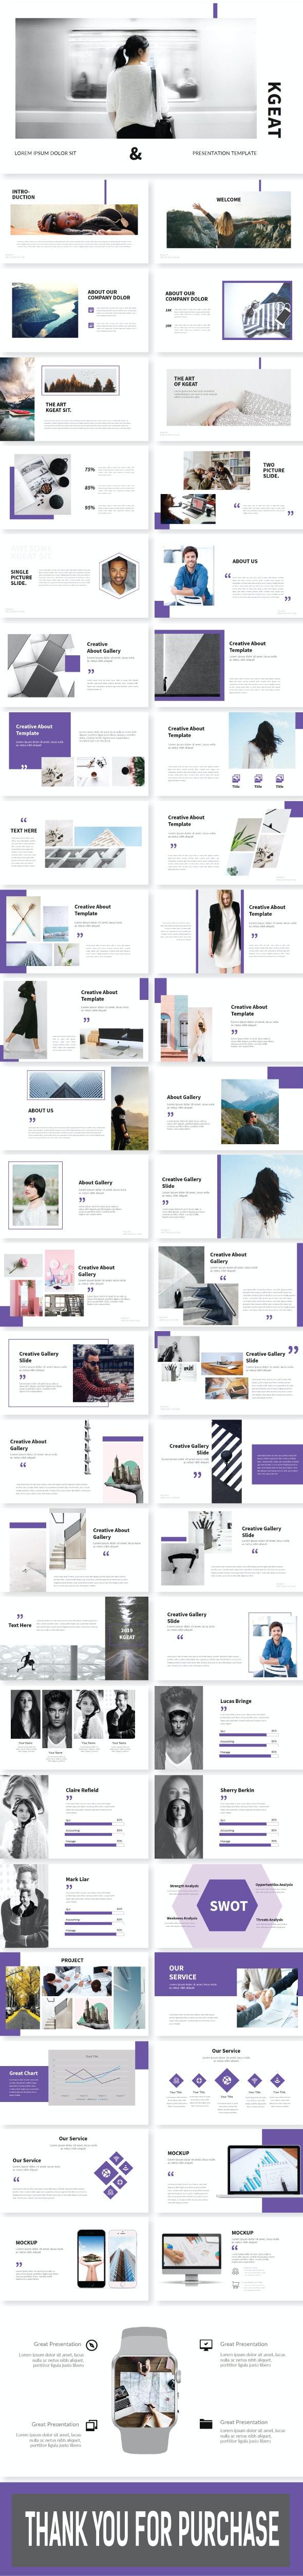 Kgeat Presentation Template - Creative PowerPoint Templates